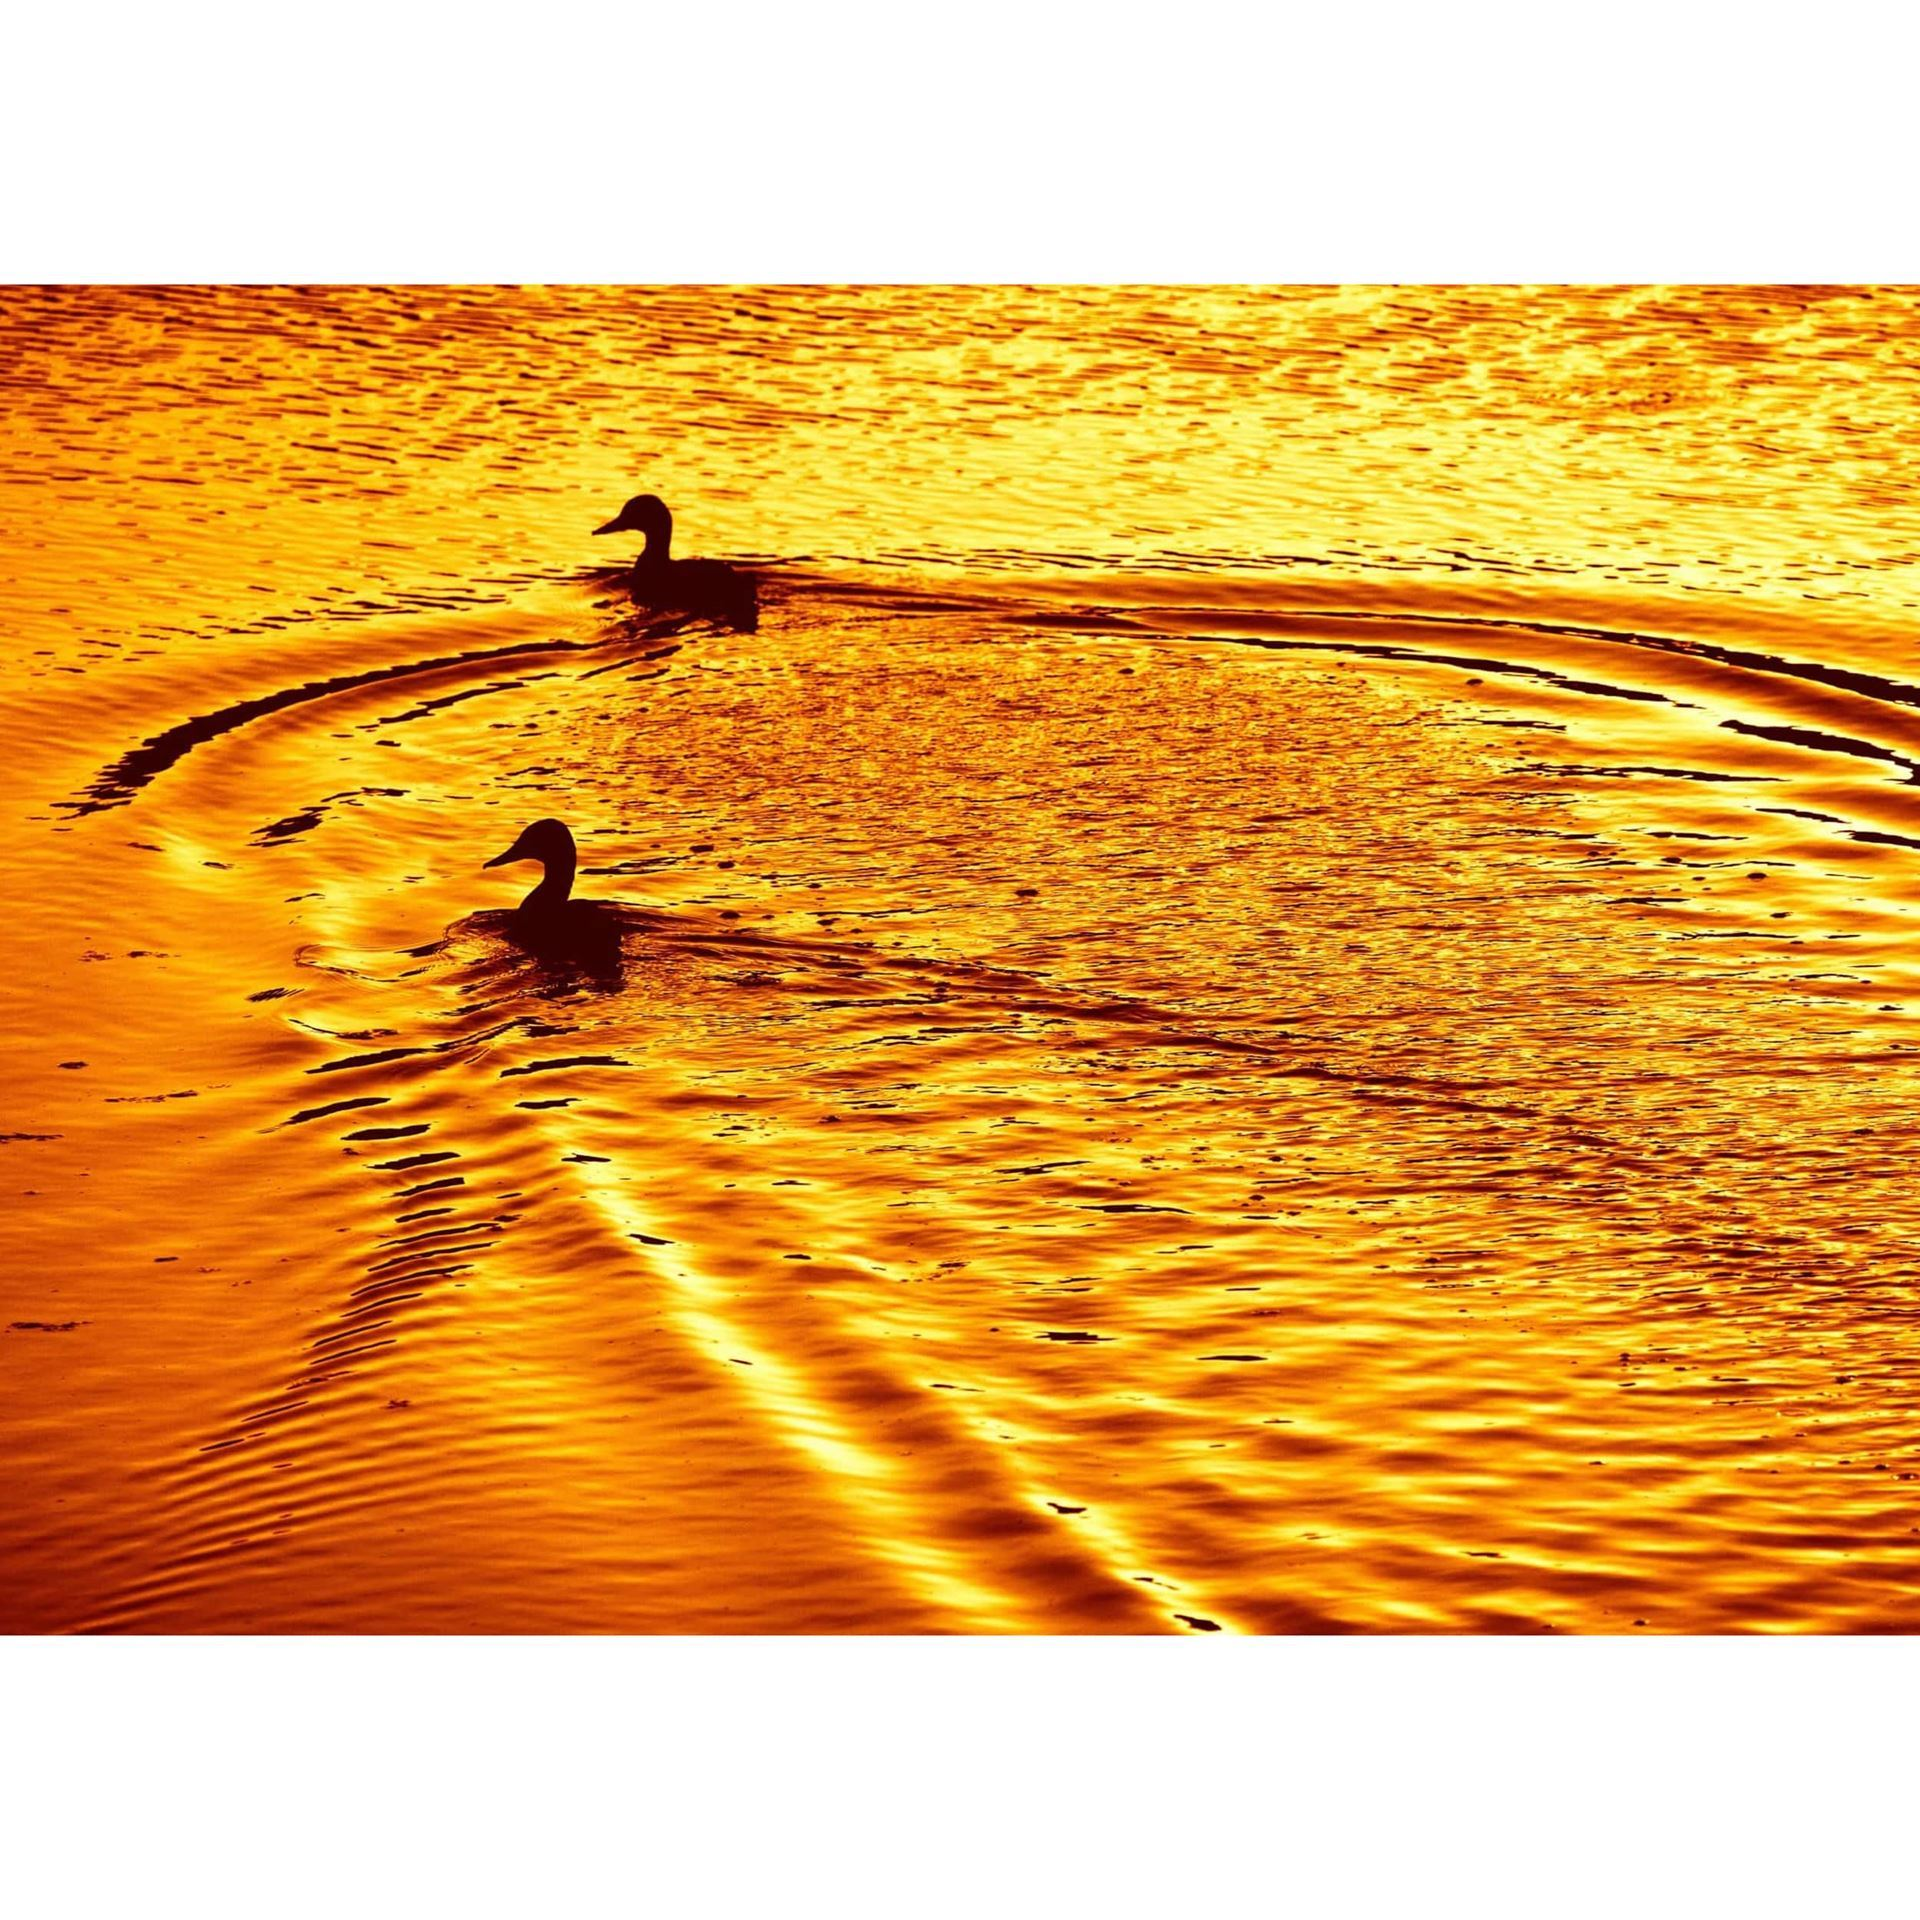 Ducks At Sunset 24x16